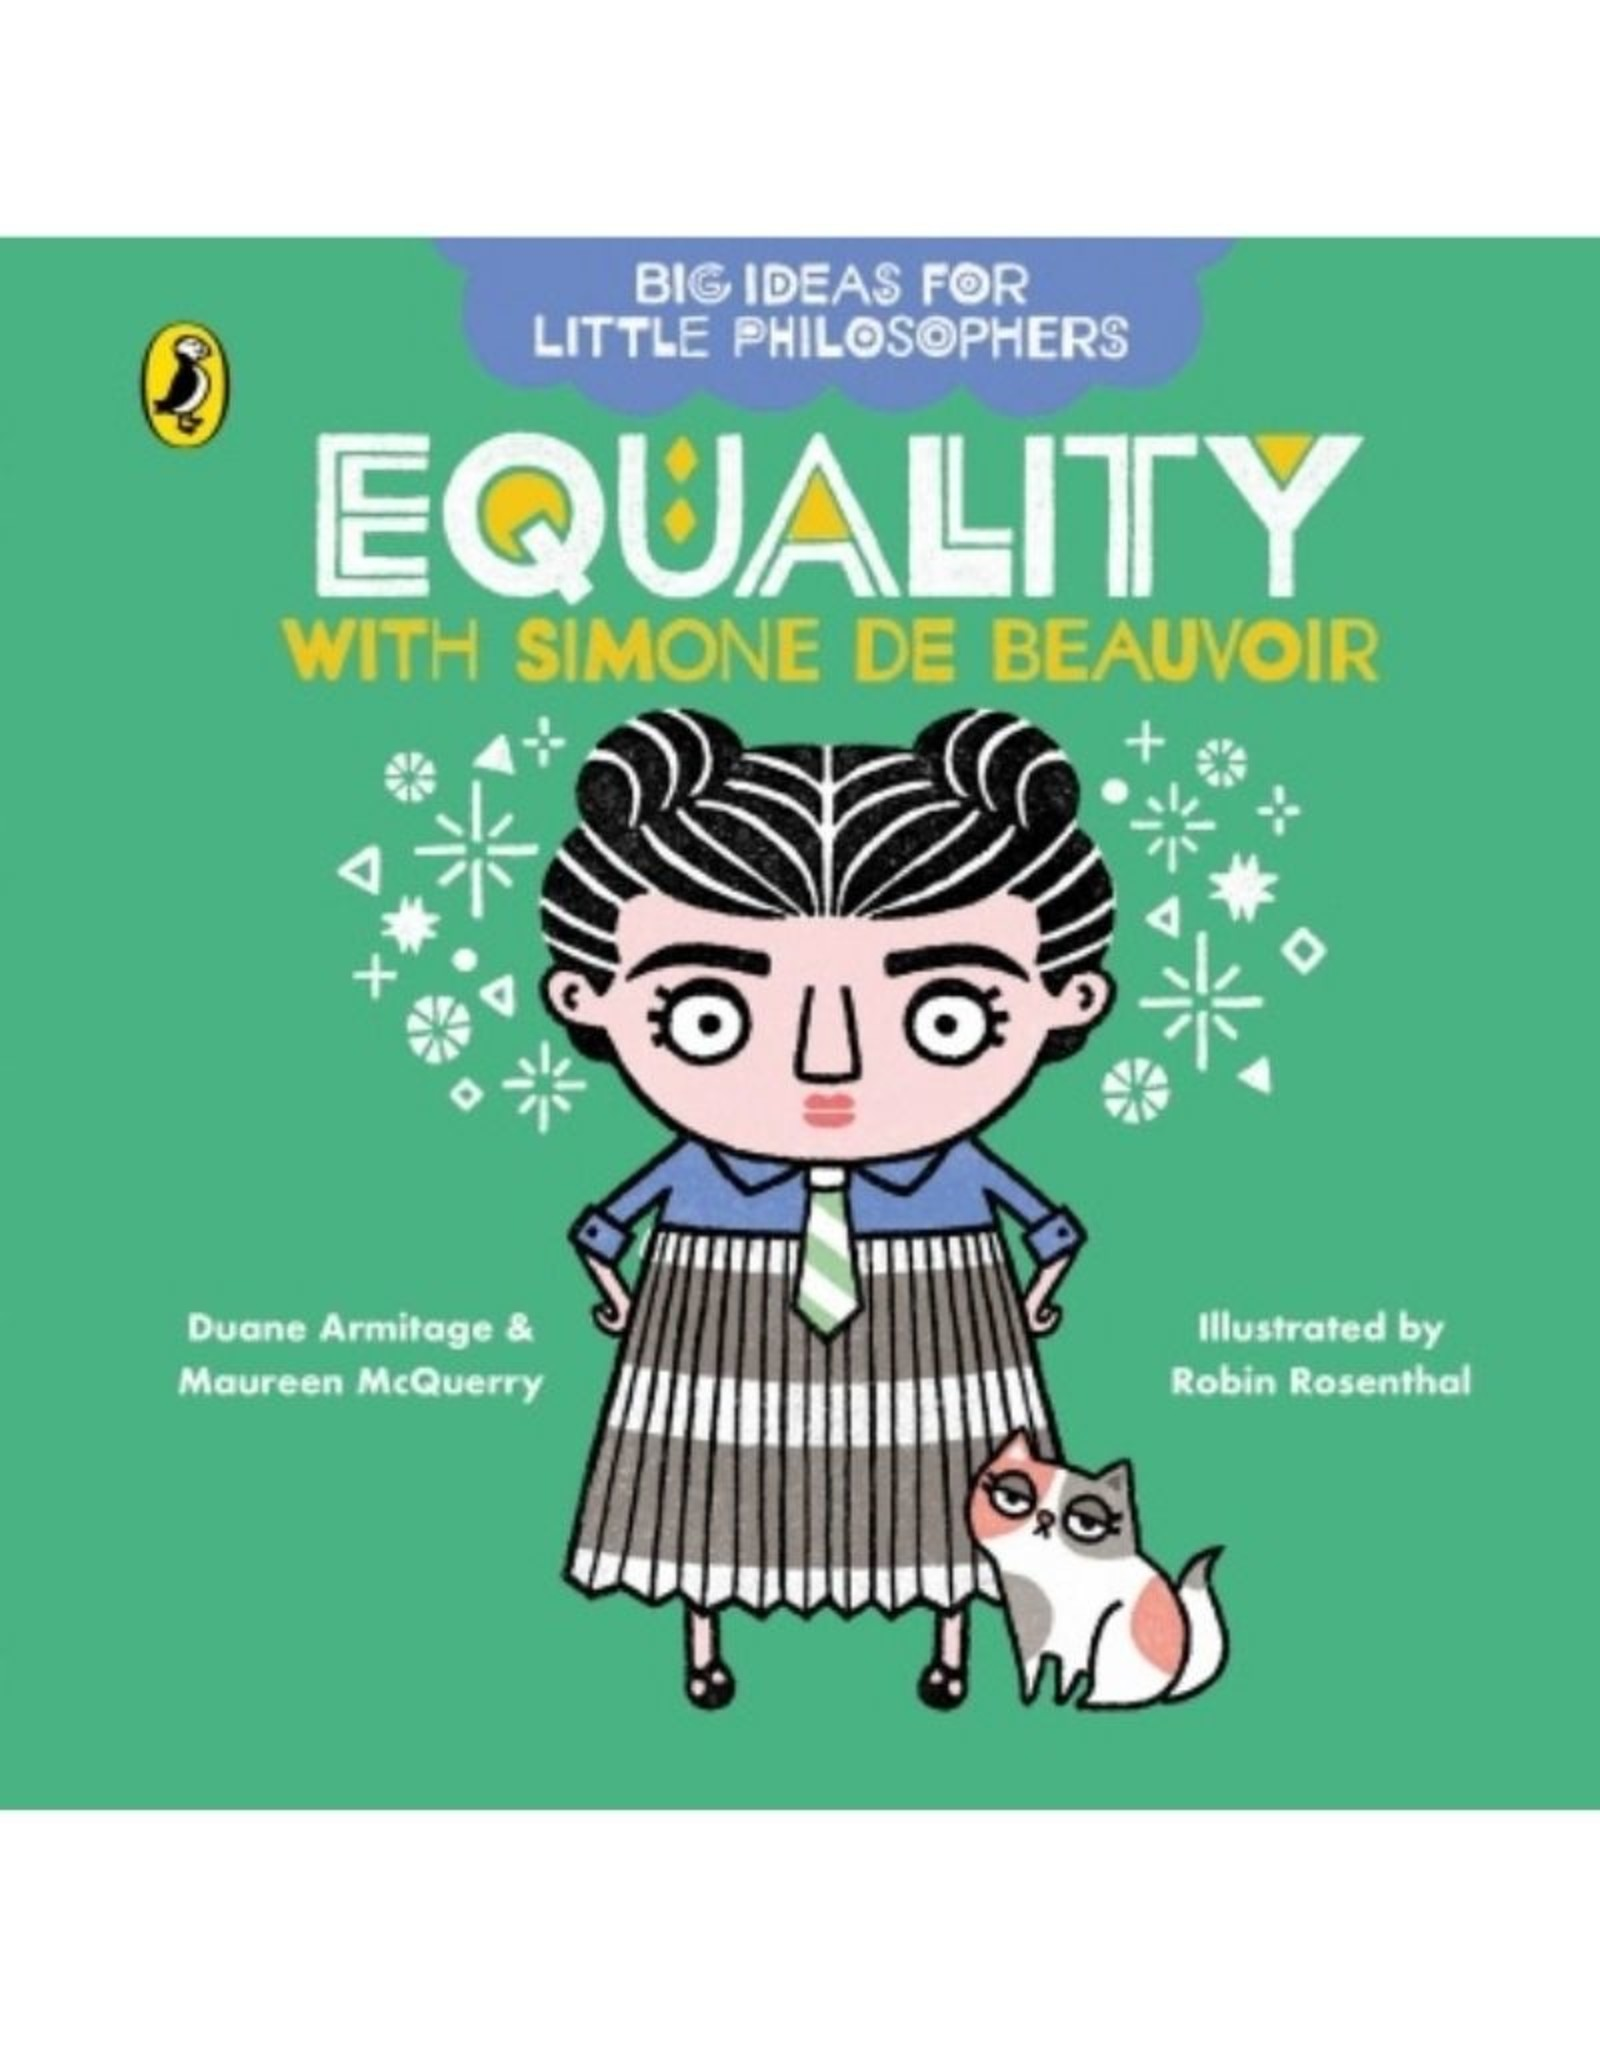 Big Ideas for Little Philosophers - Equality with Simone De Beauvoir